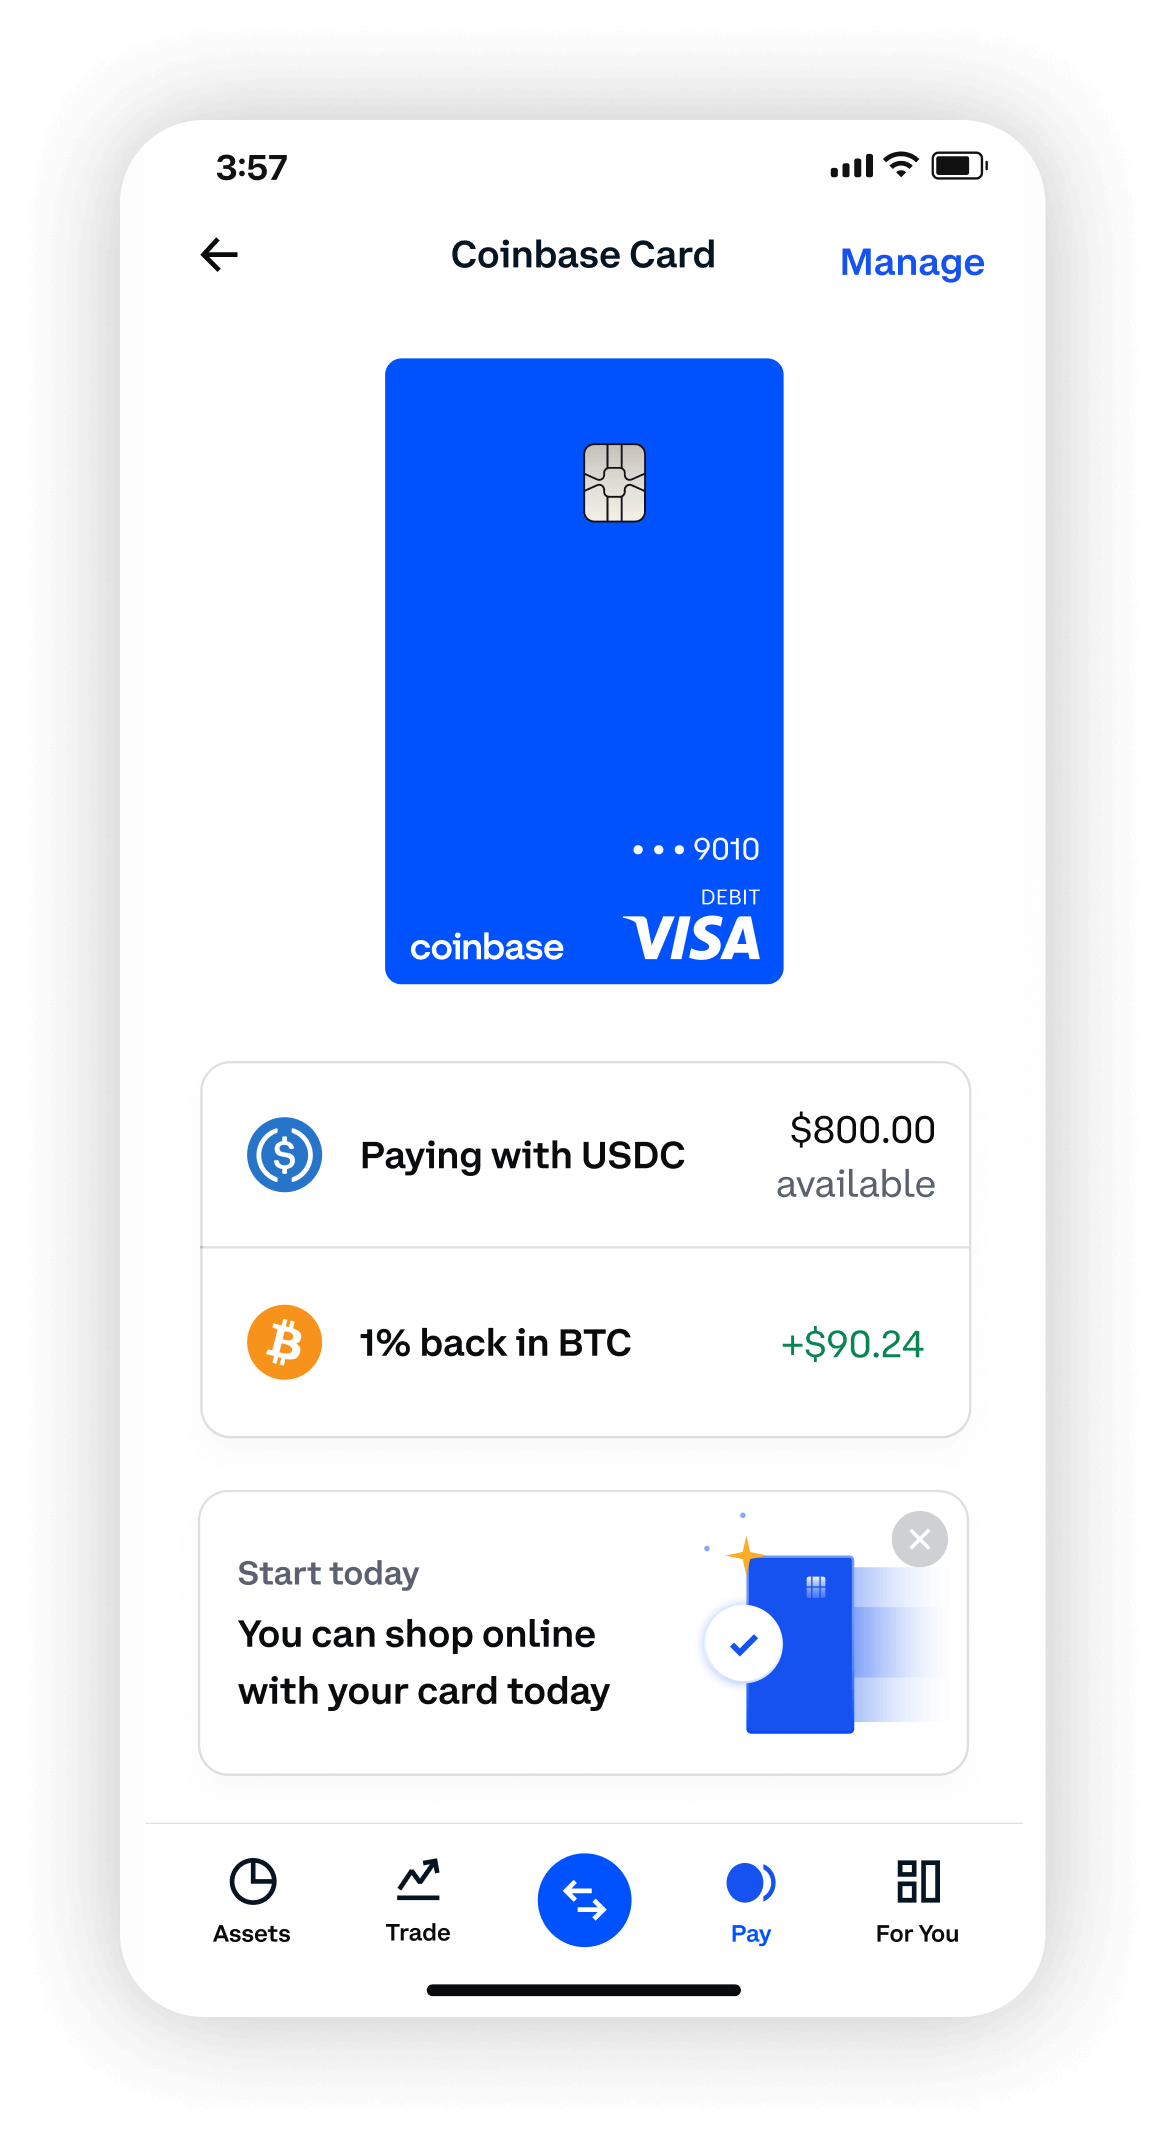 Card interface